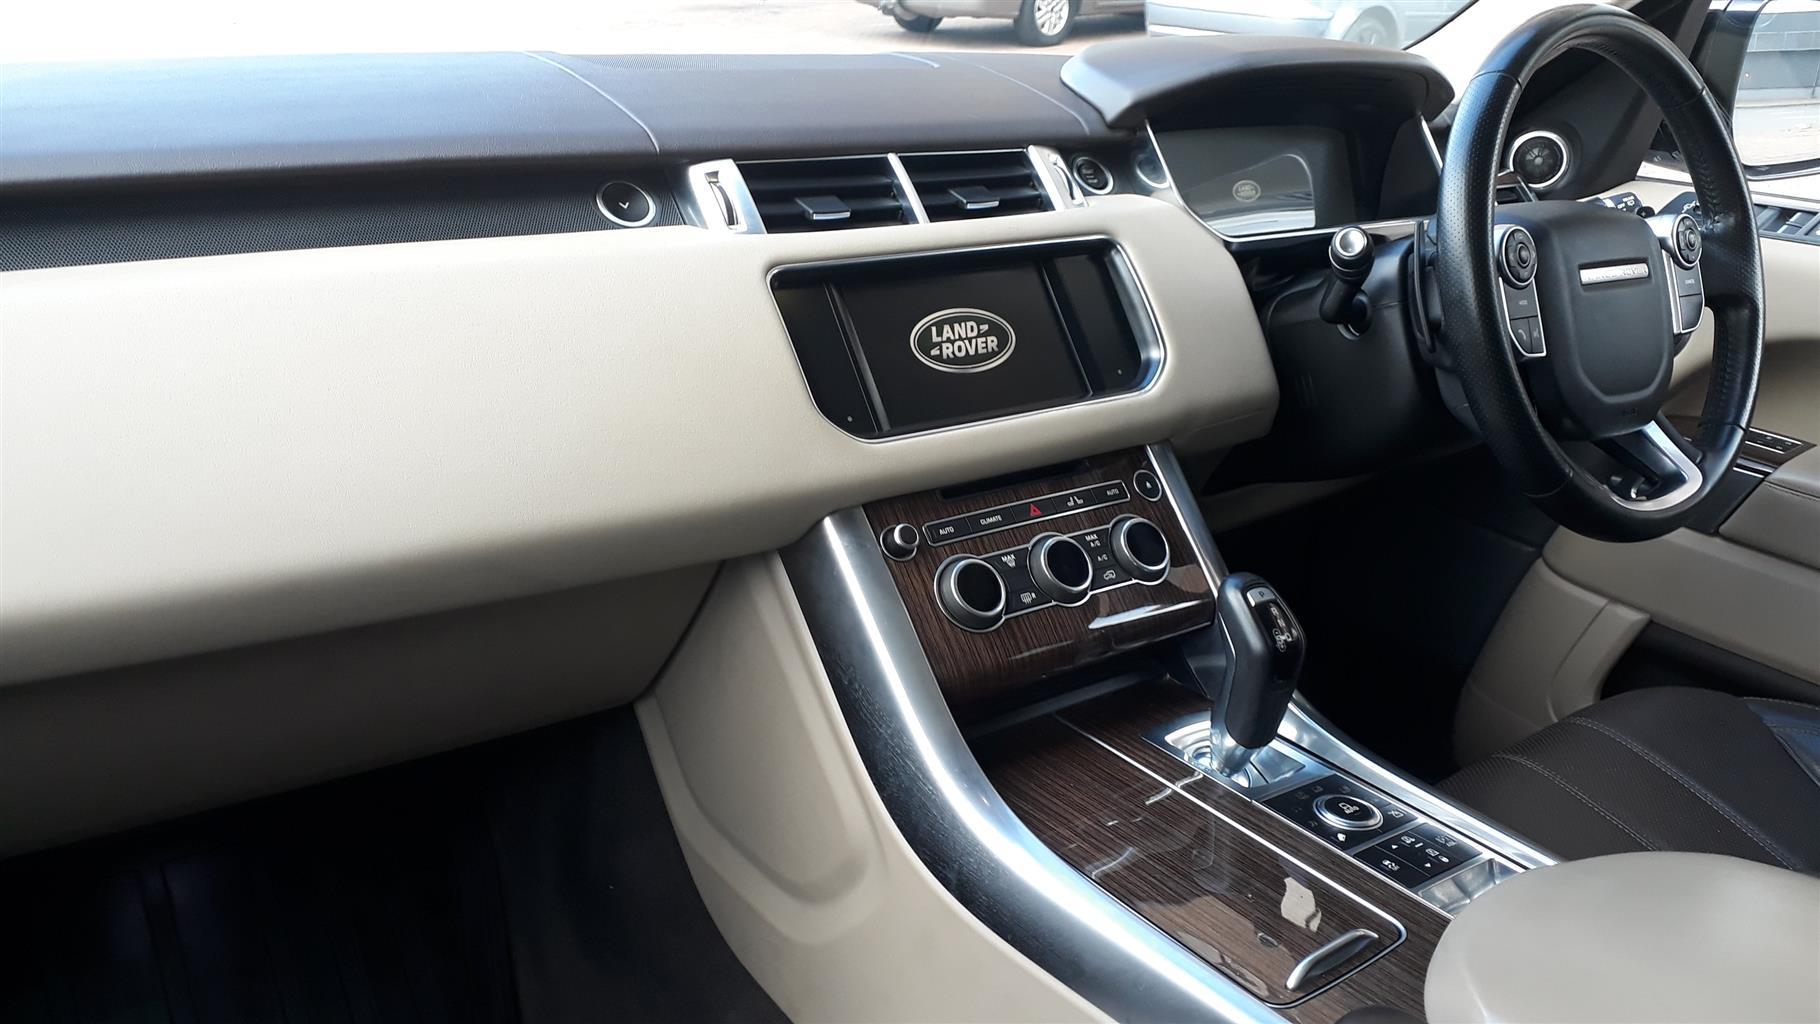 2017 Land Rover Range Rover Sport HSE Dynamic SDV8